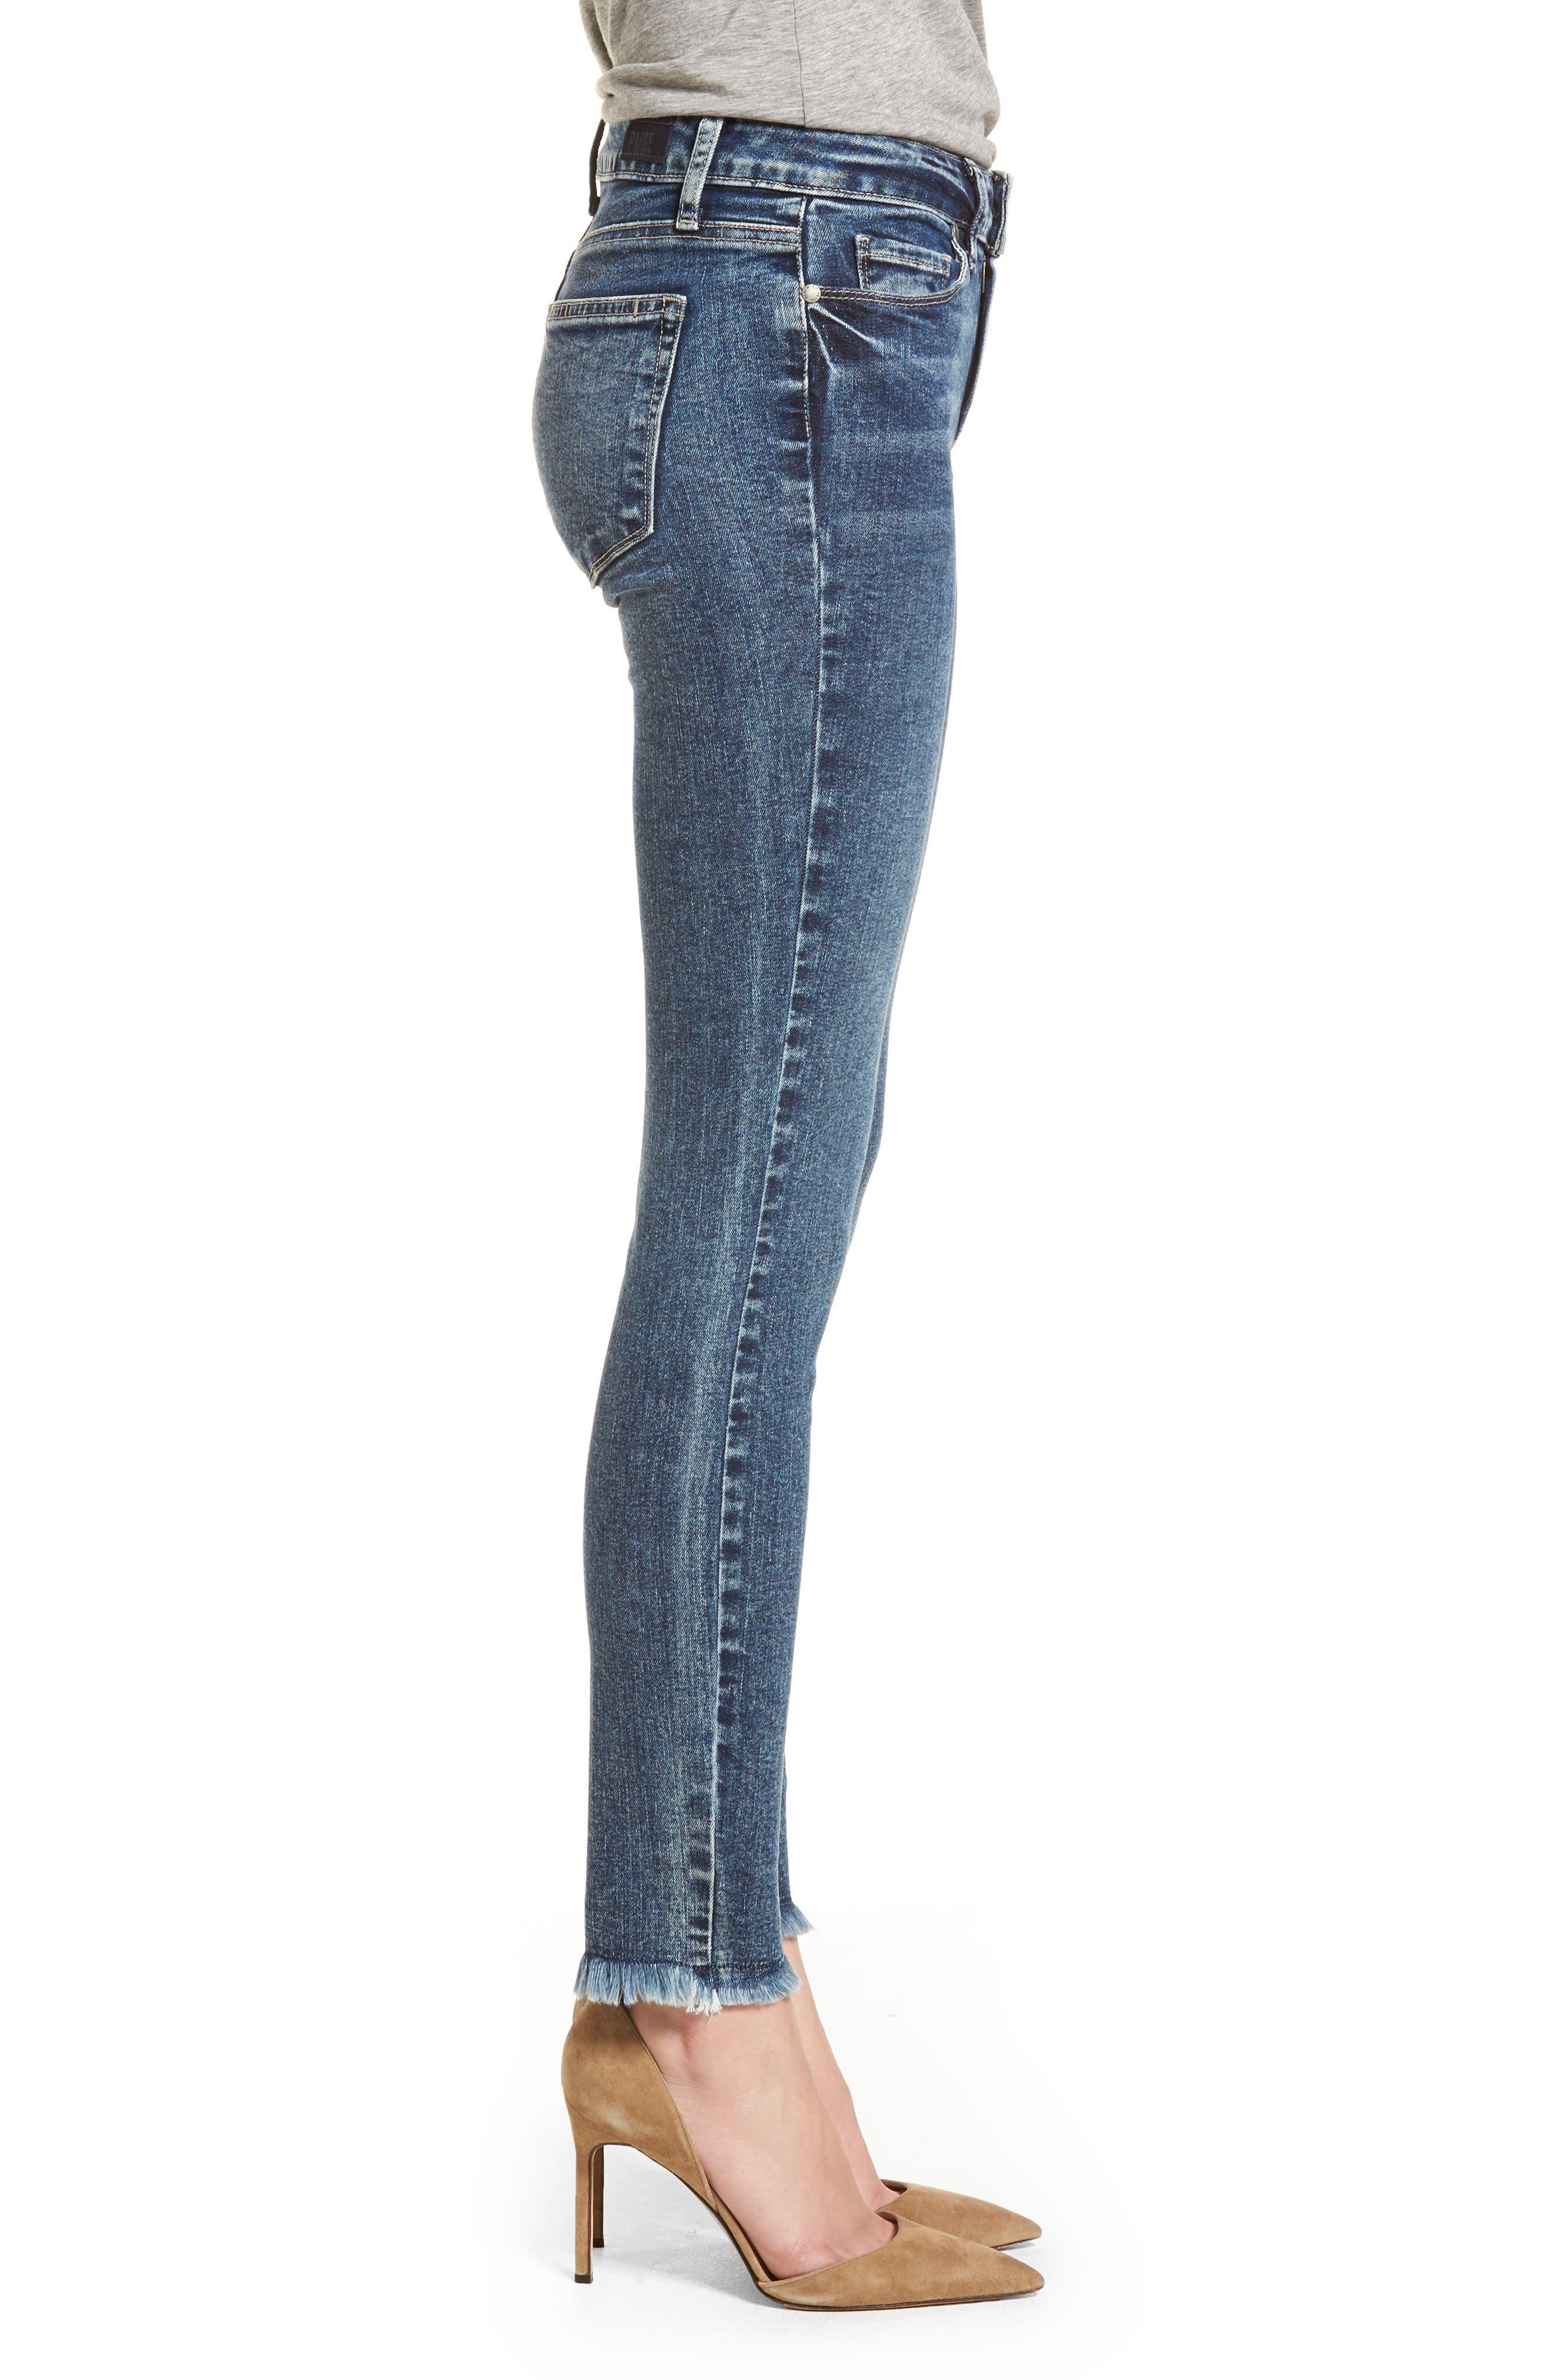 Transcend Vintage - Verdugo Ultra Skinny Jeans,                             Alternate thumbnail 3, color,                             400